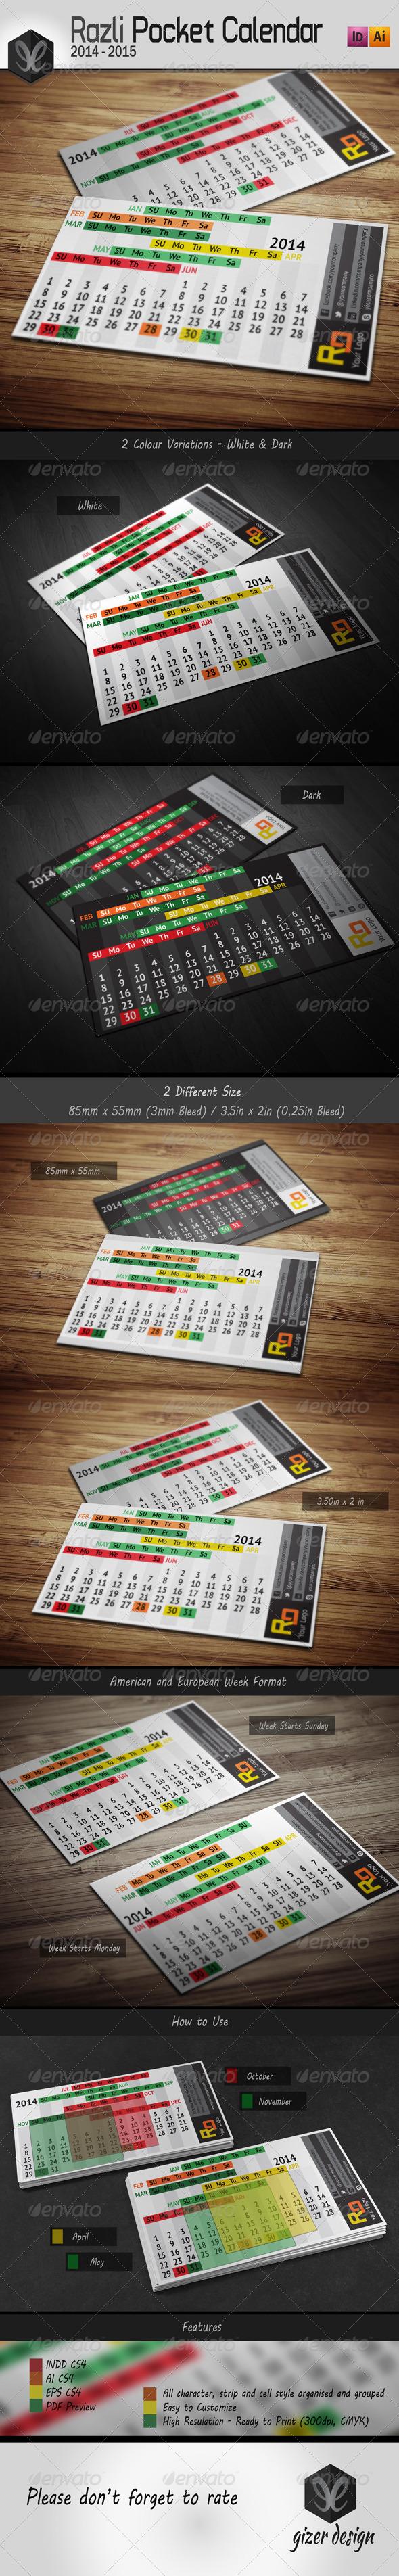 Pocket Calendar 2014 - 2015 / Razli - Calendars Stationery